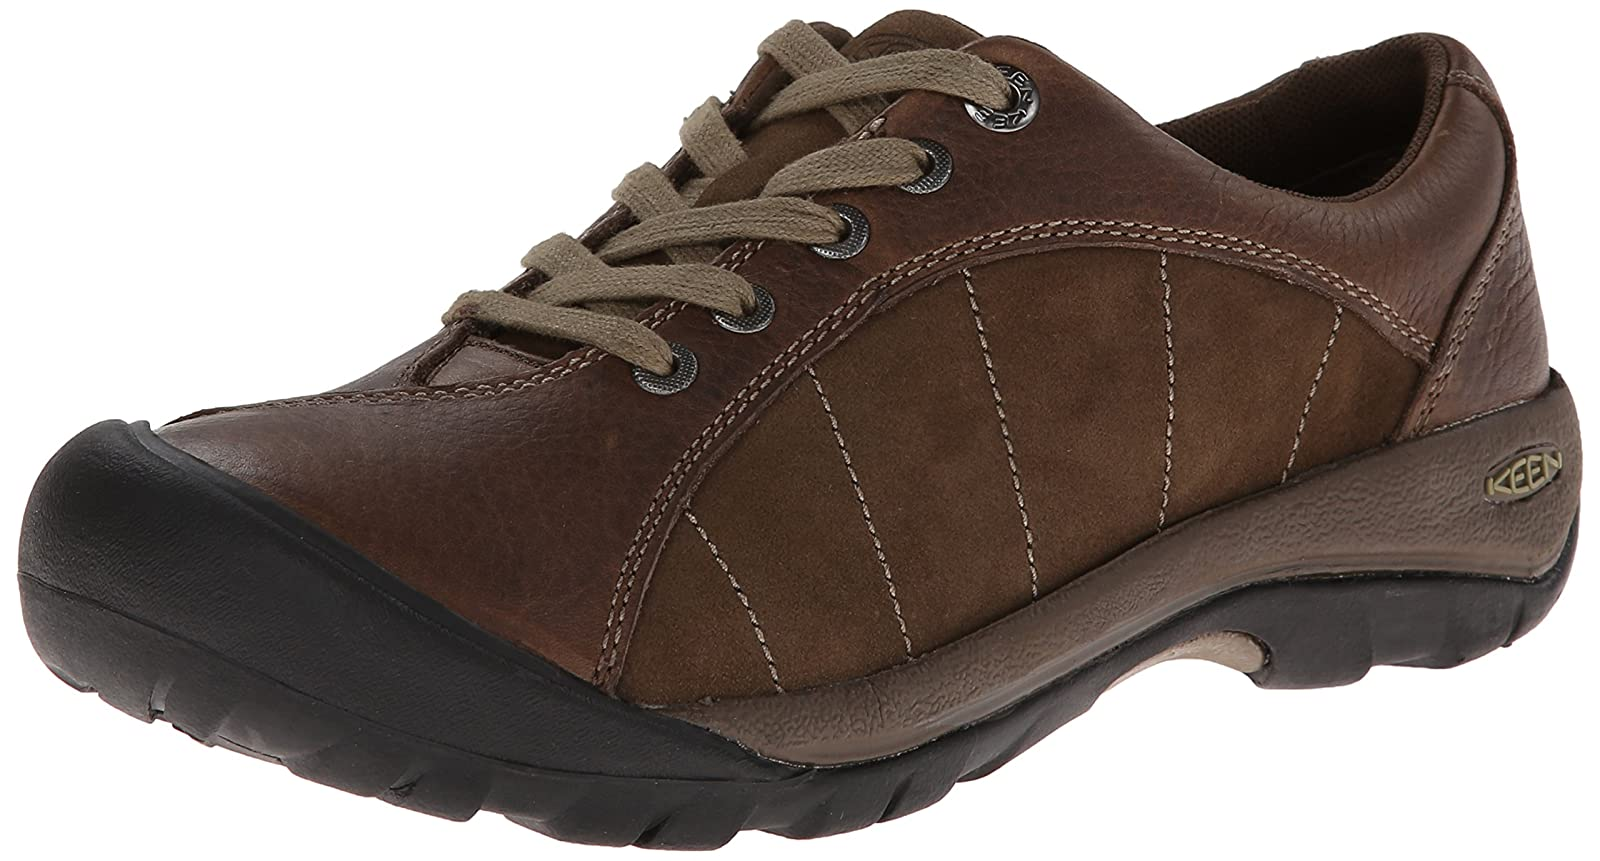 KEEN Women's Presidio Shoe Cascade Brown/Shitake 9.5 M US Women - 1